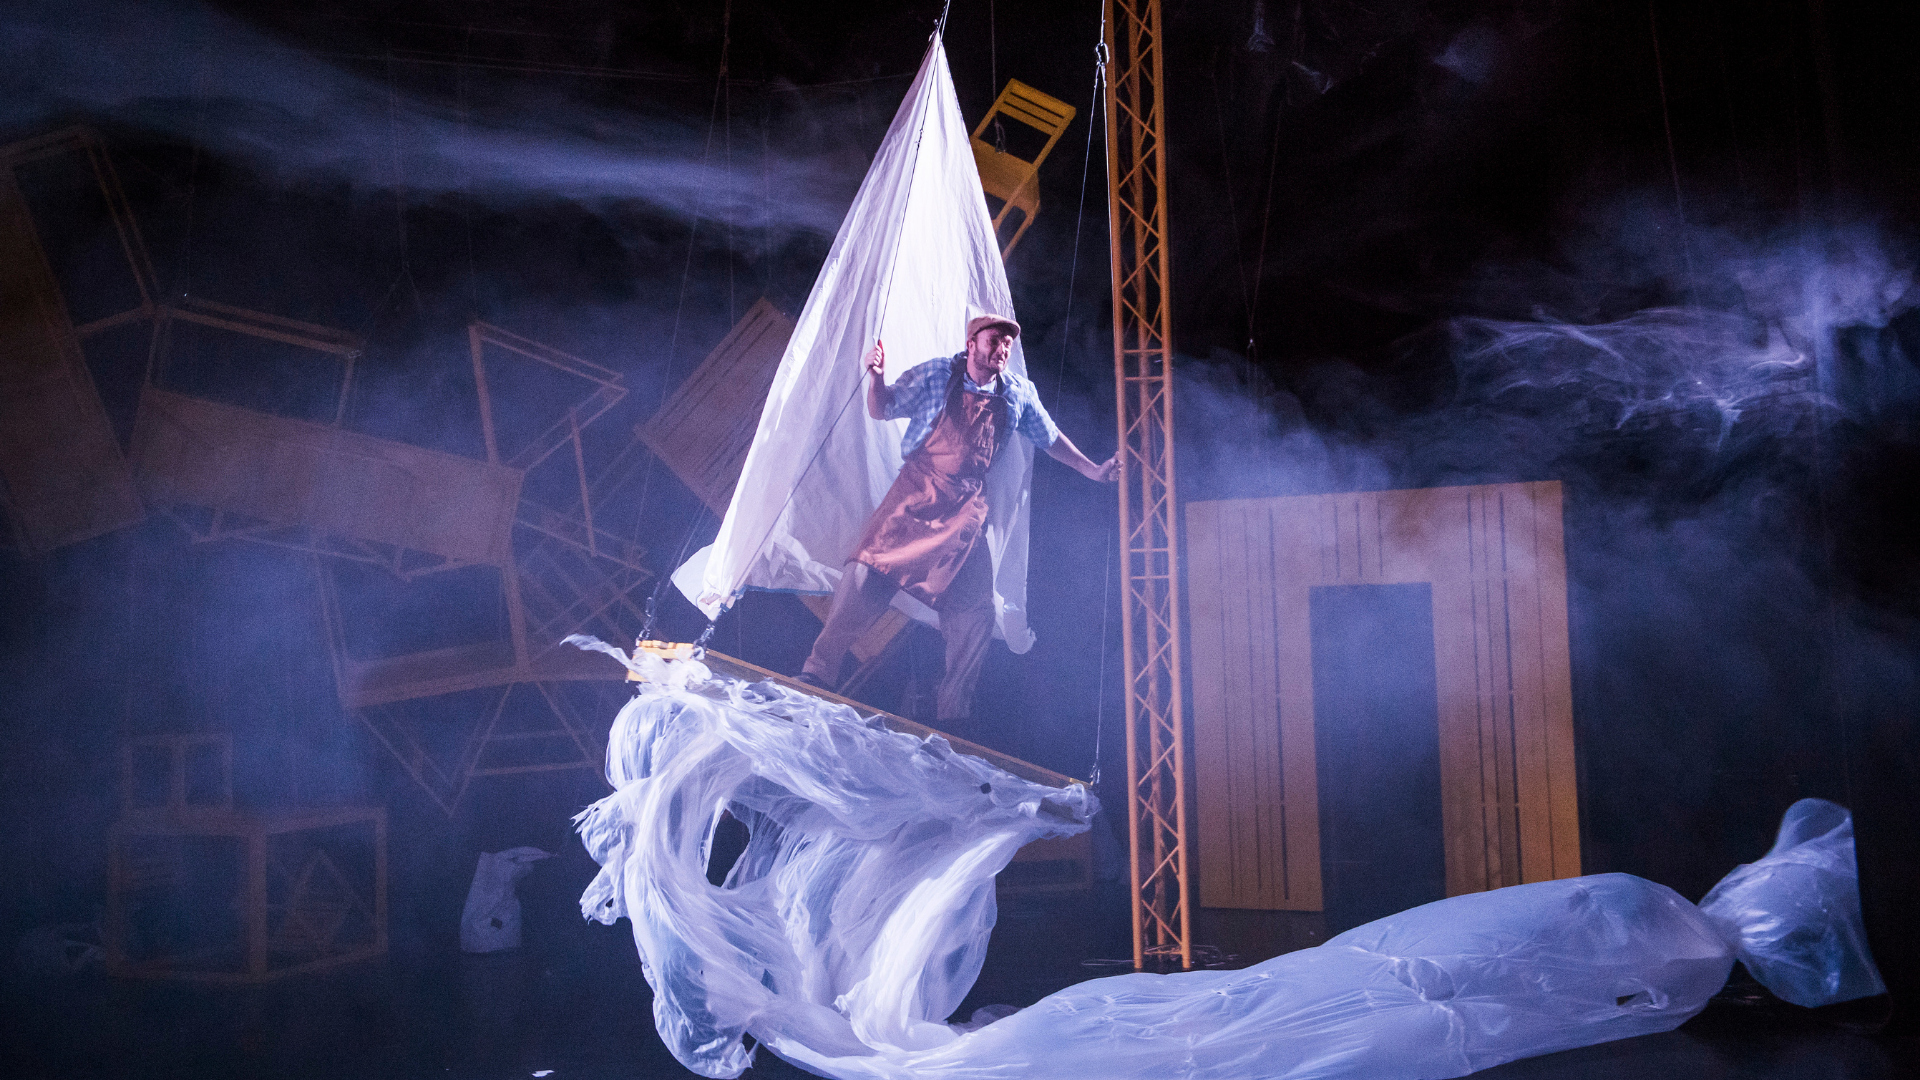 JVC' Pinocchio, featuring dancer David Lloyd